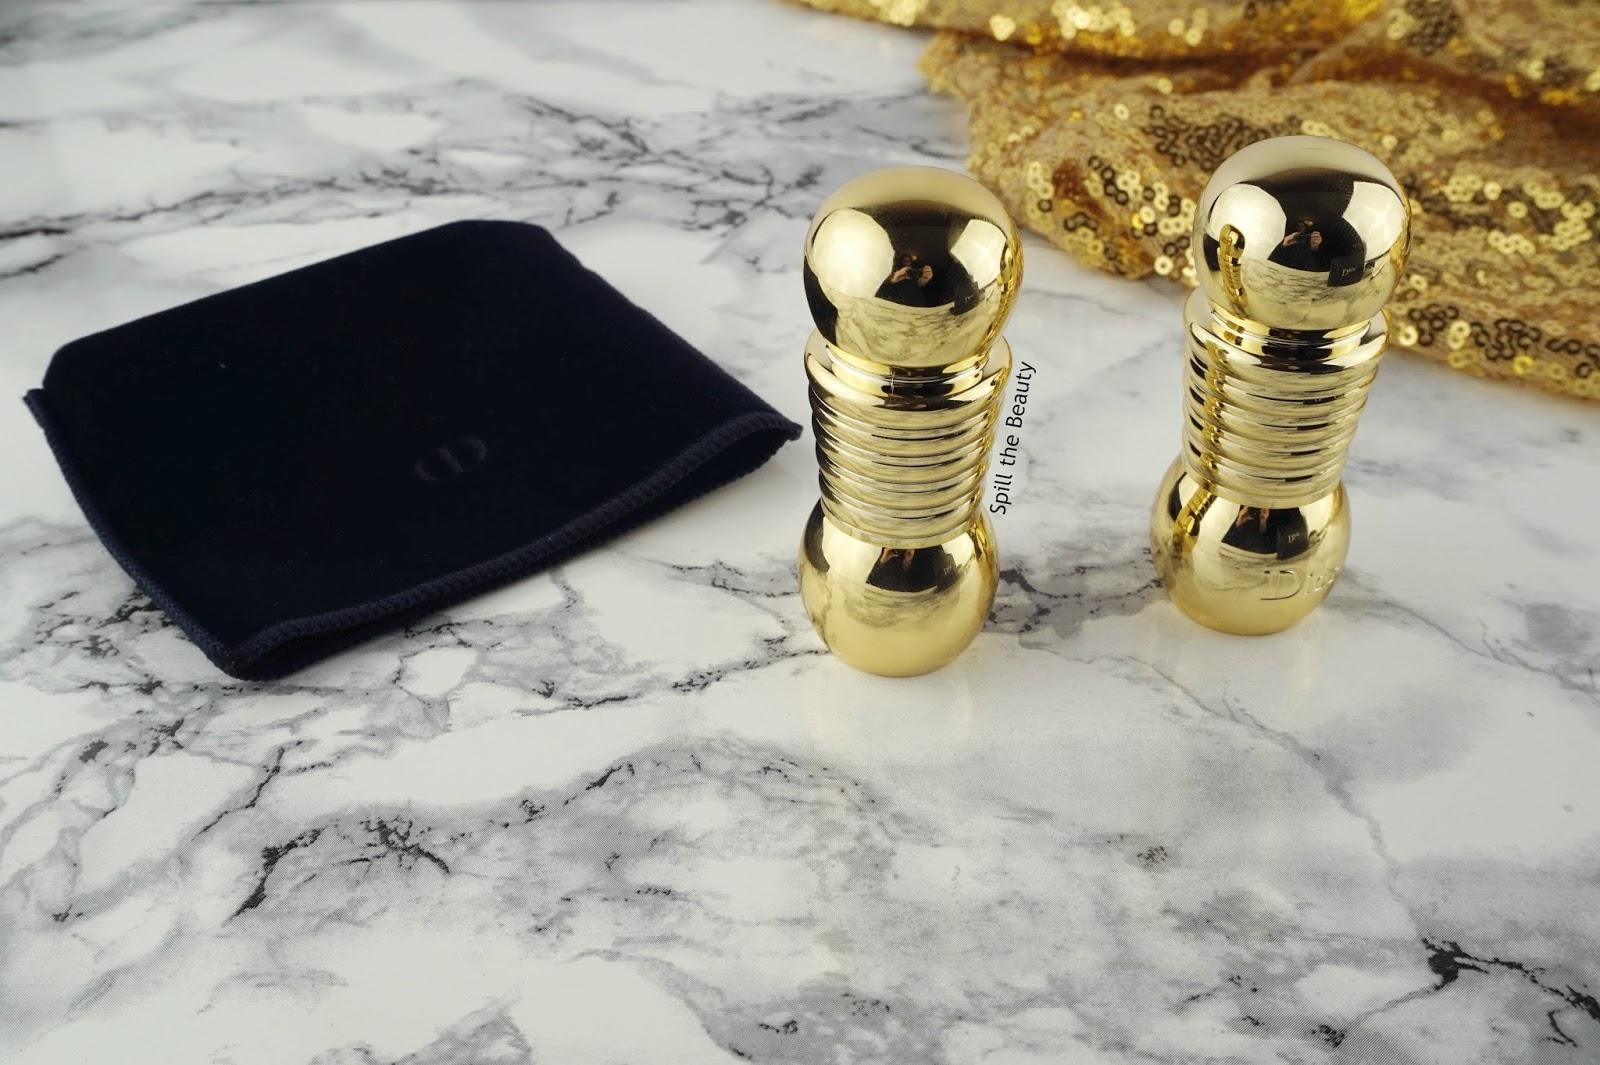 dior holiday makeup 2016 2 lipstick swatch charm golden